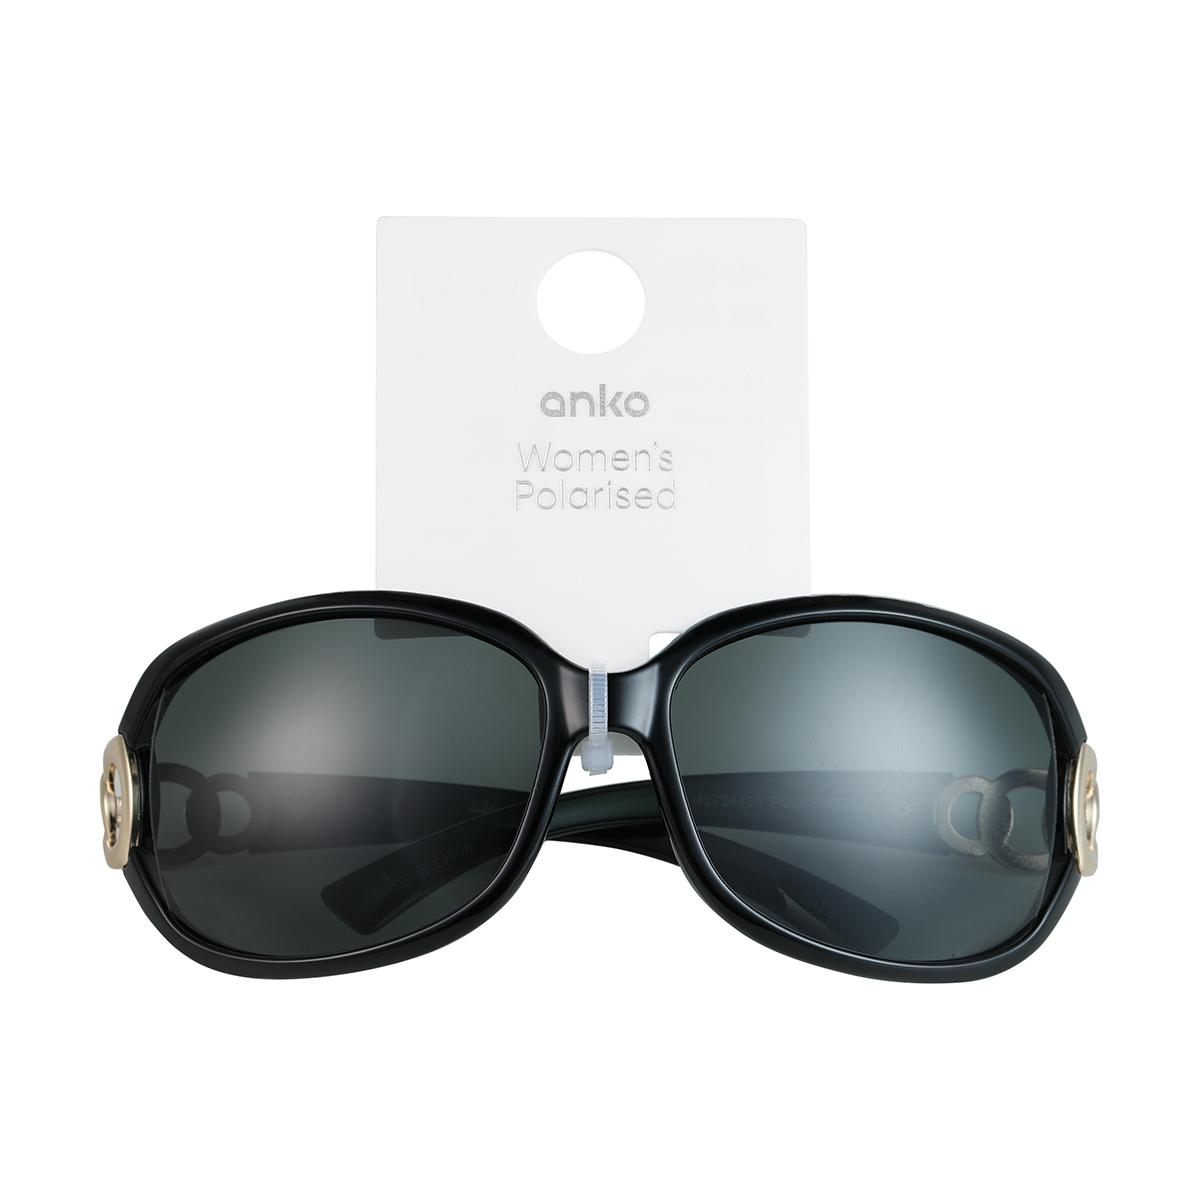 1e2d7009336b Gold Look Link Polarised Sunglasses